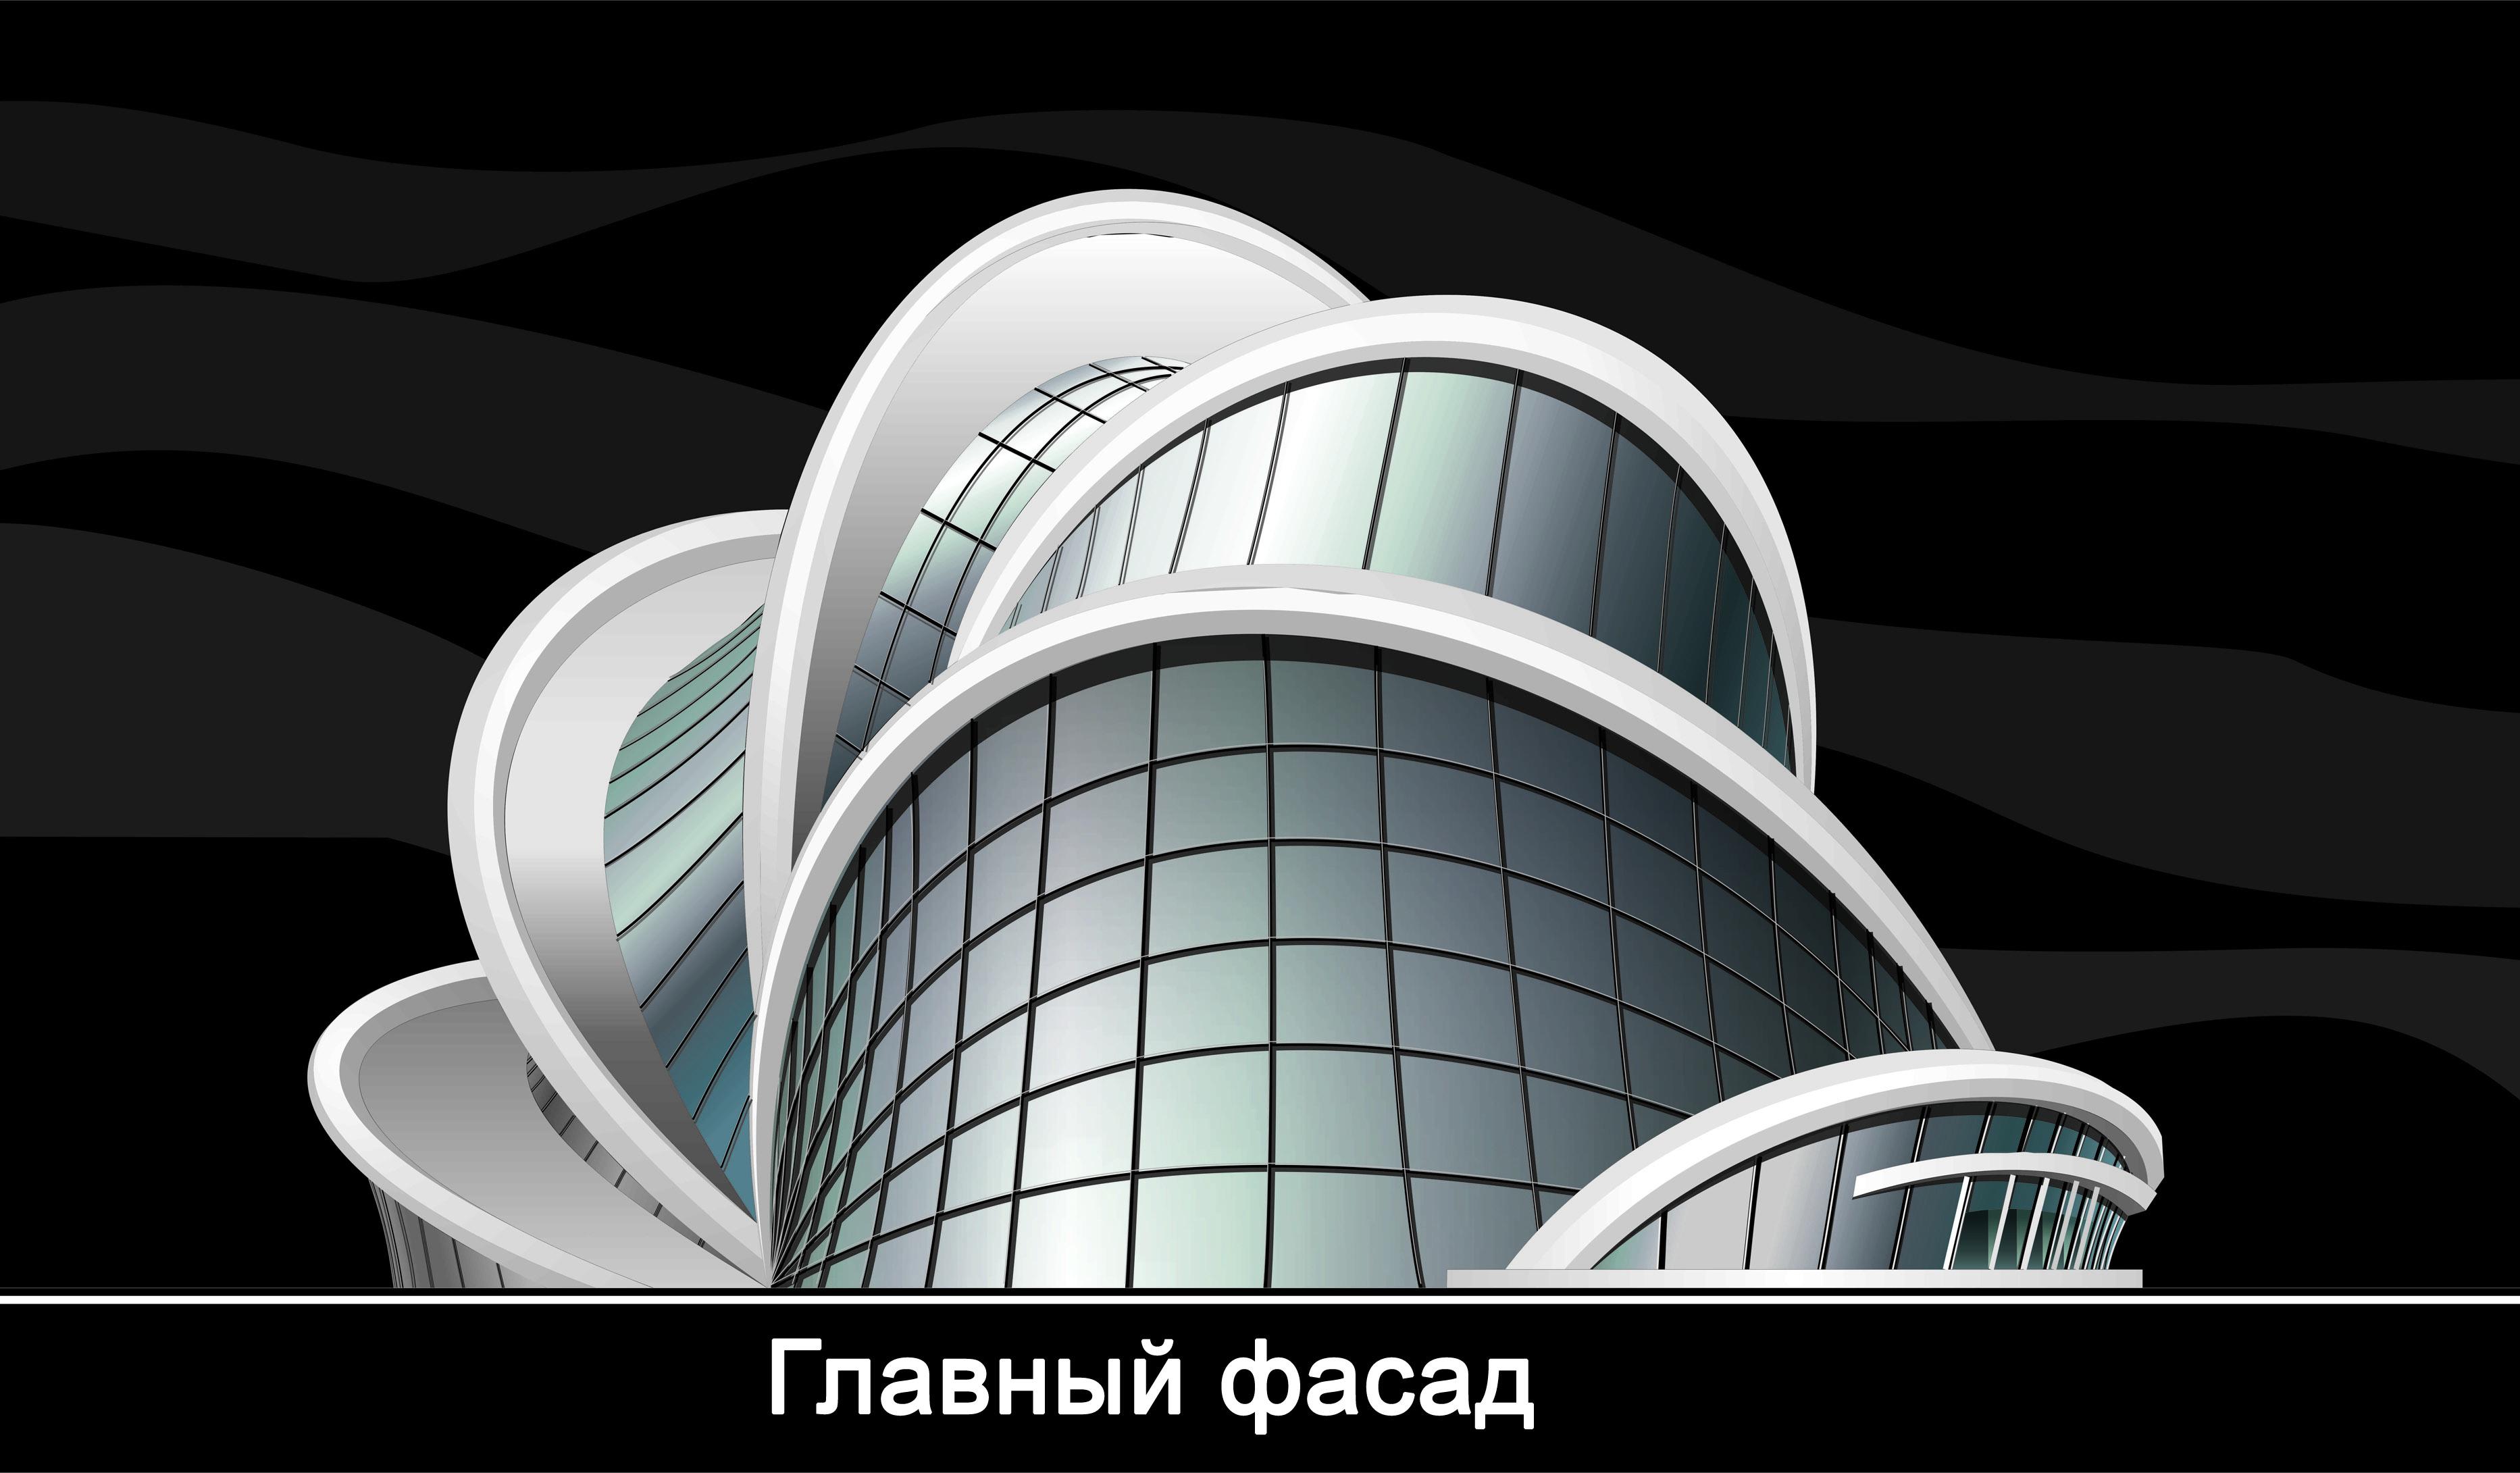 Разработка архитектурной концепции театра оперы и балета фото f_03252f67d1456ba4.jpg